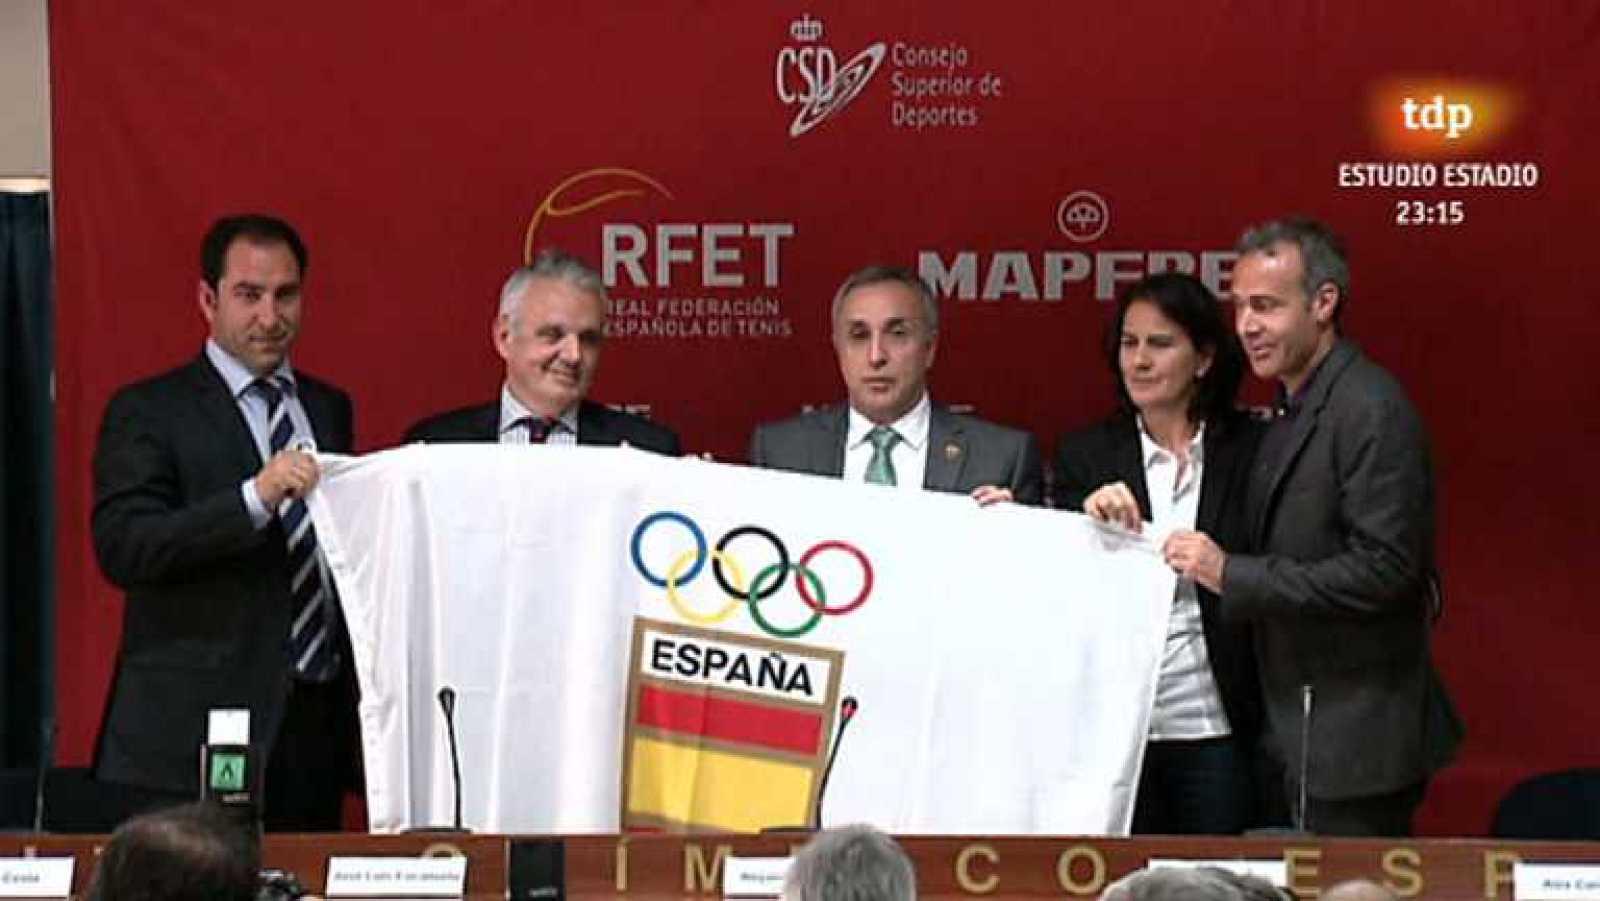 Madrid 2020 - 03/05/13 - Ver ahora